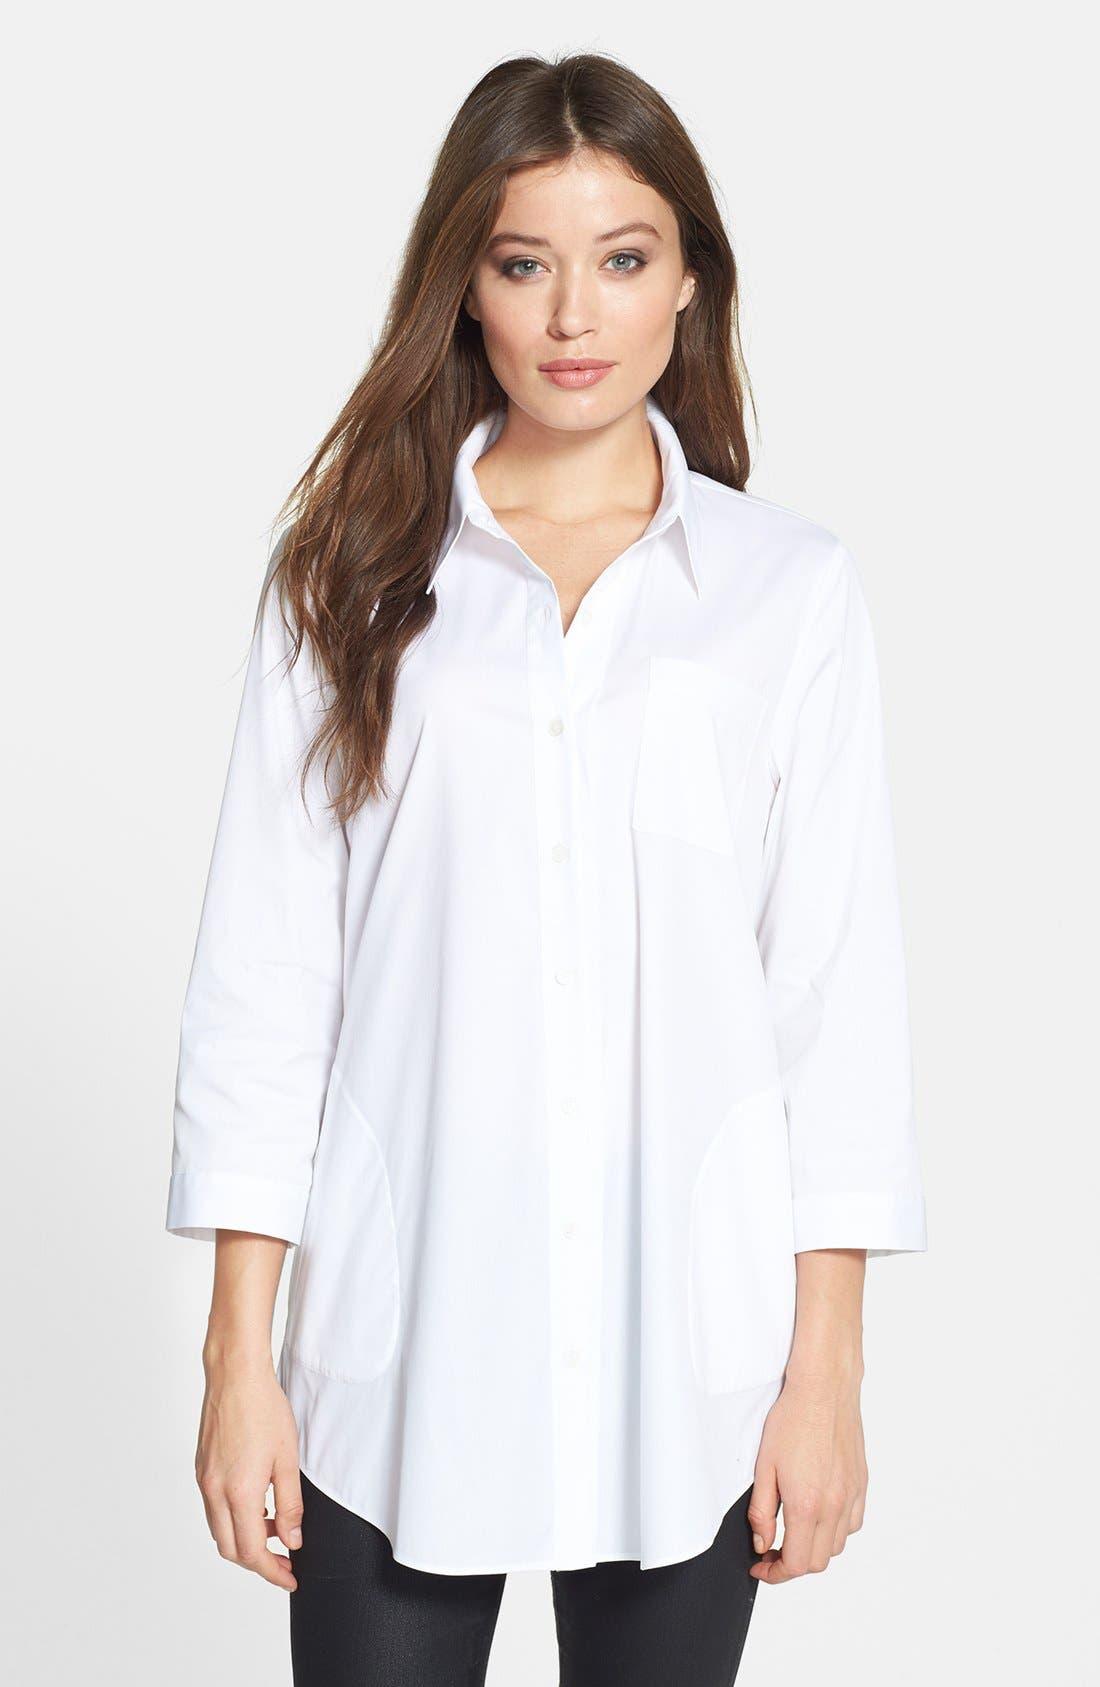 Main Image - Lafayette 148 New York 'Tierny - Excursion Stretch' Tunic Shirt